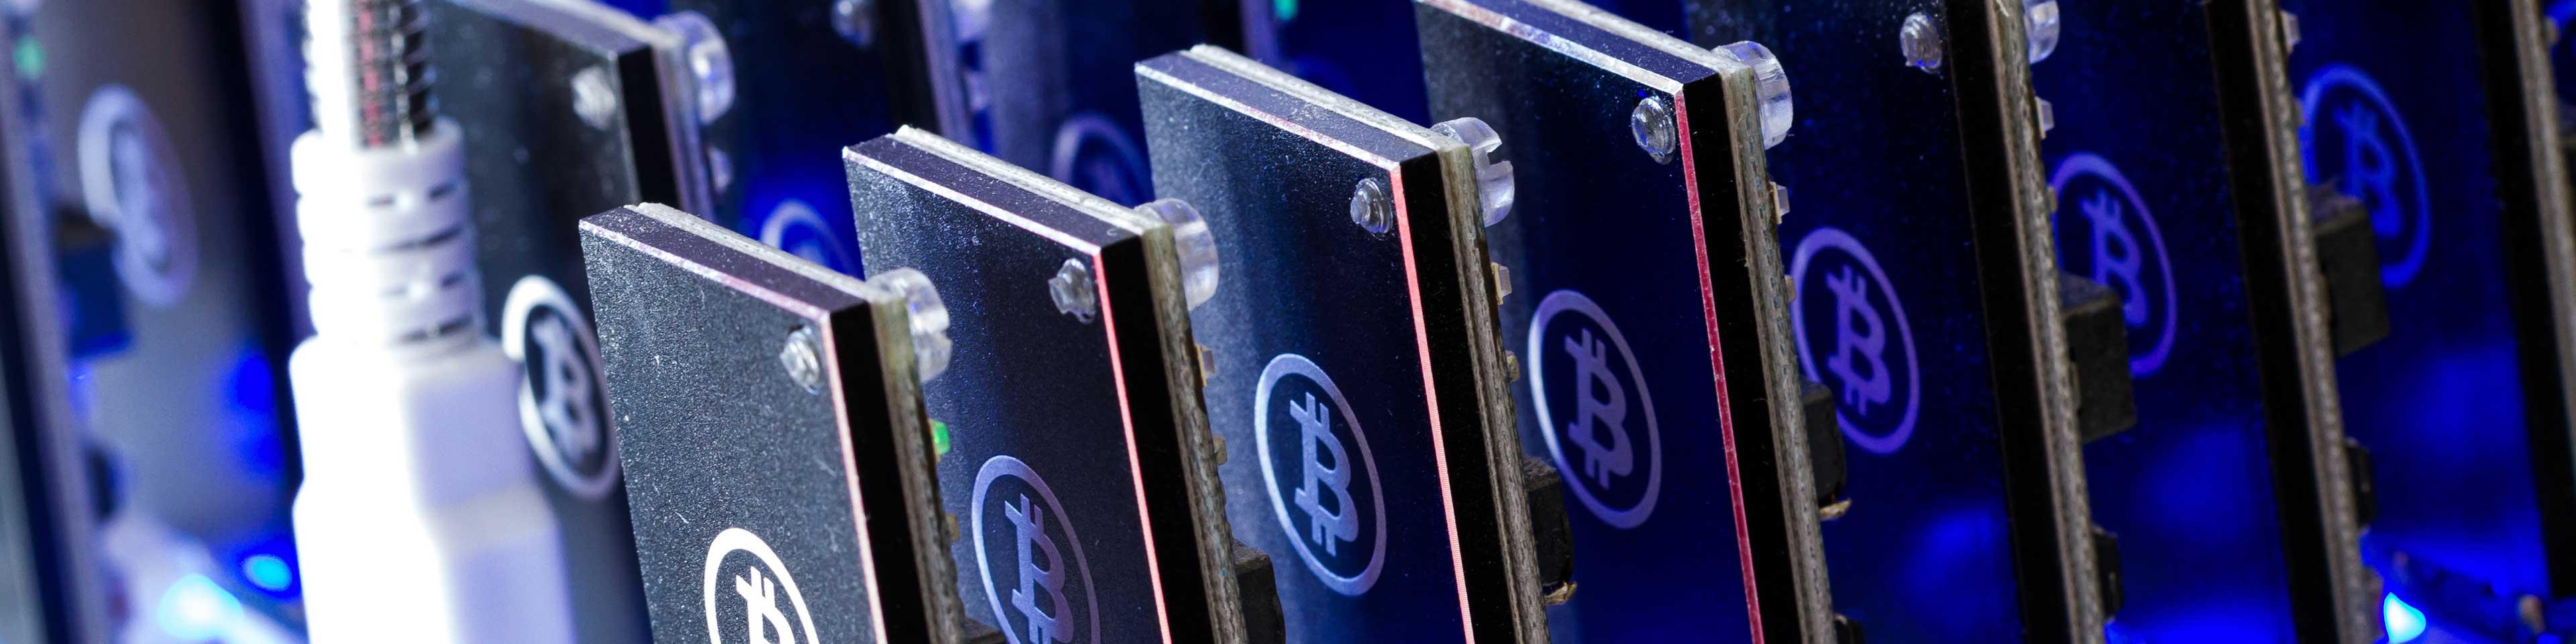 Key details of new infrastructure bill text regarding cryptocurrencies